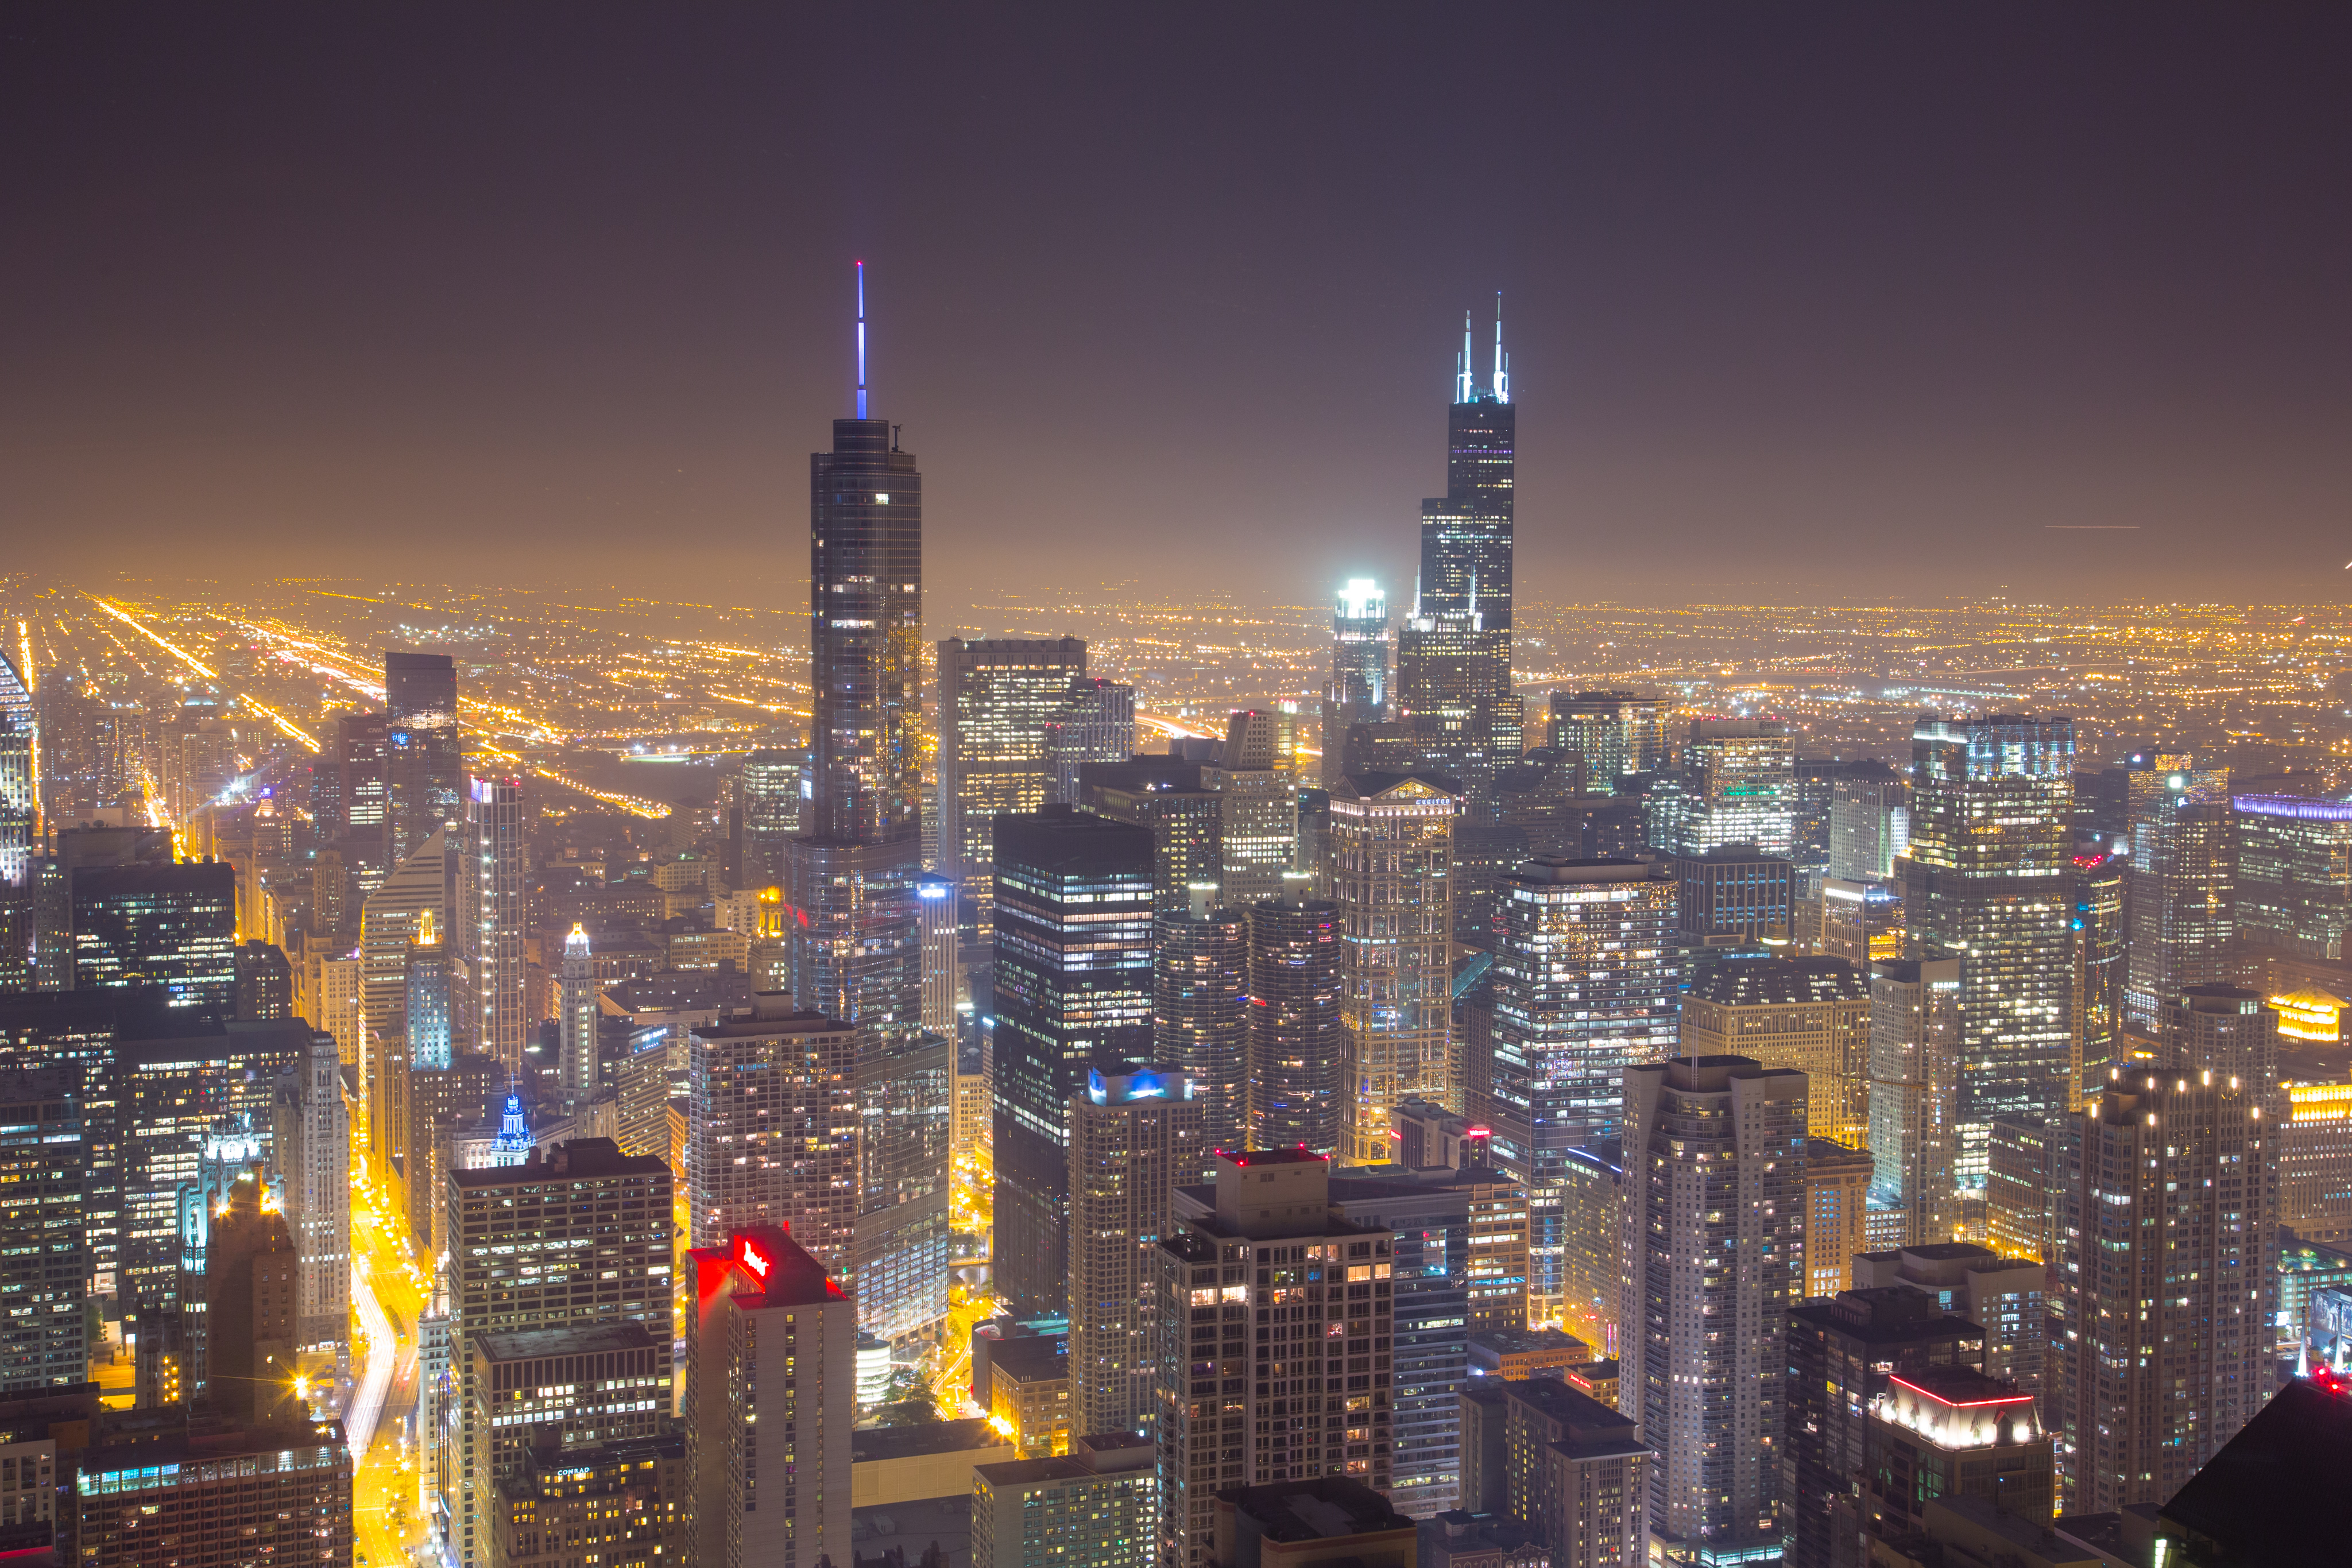 Free Download Iba Street Pictures 4k 5k Wallpaper Chicago Night